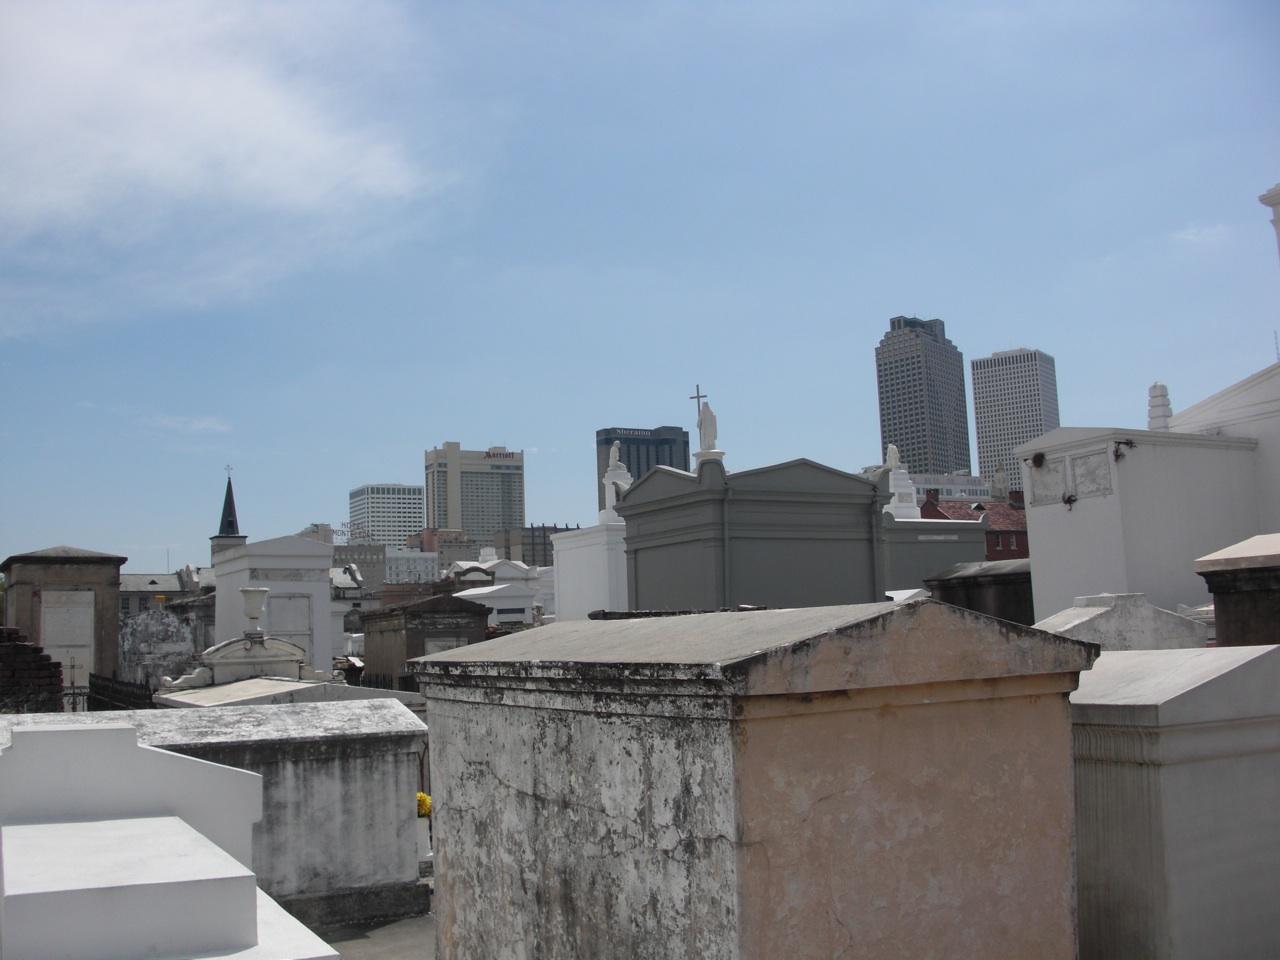 The City Skyline Behind The Cemetery